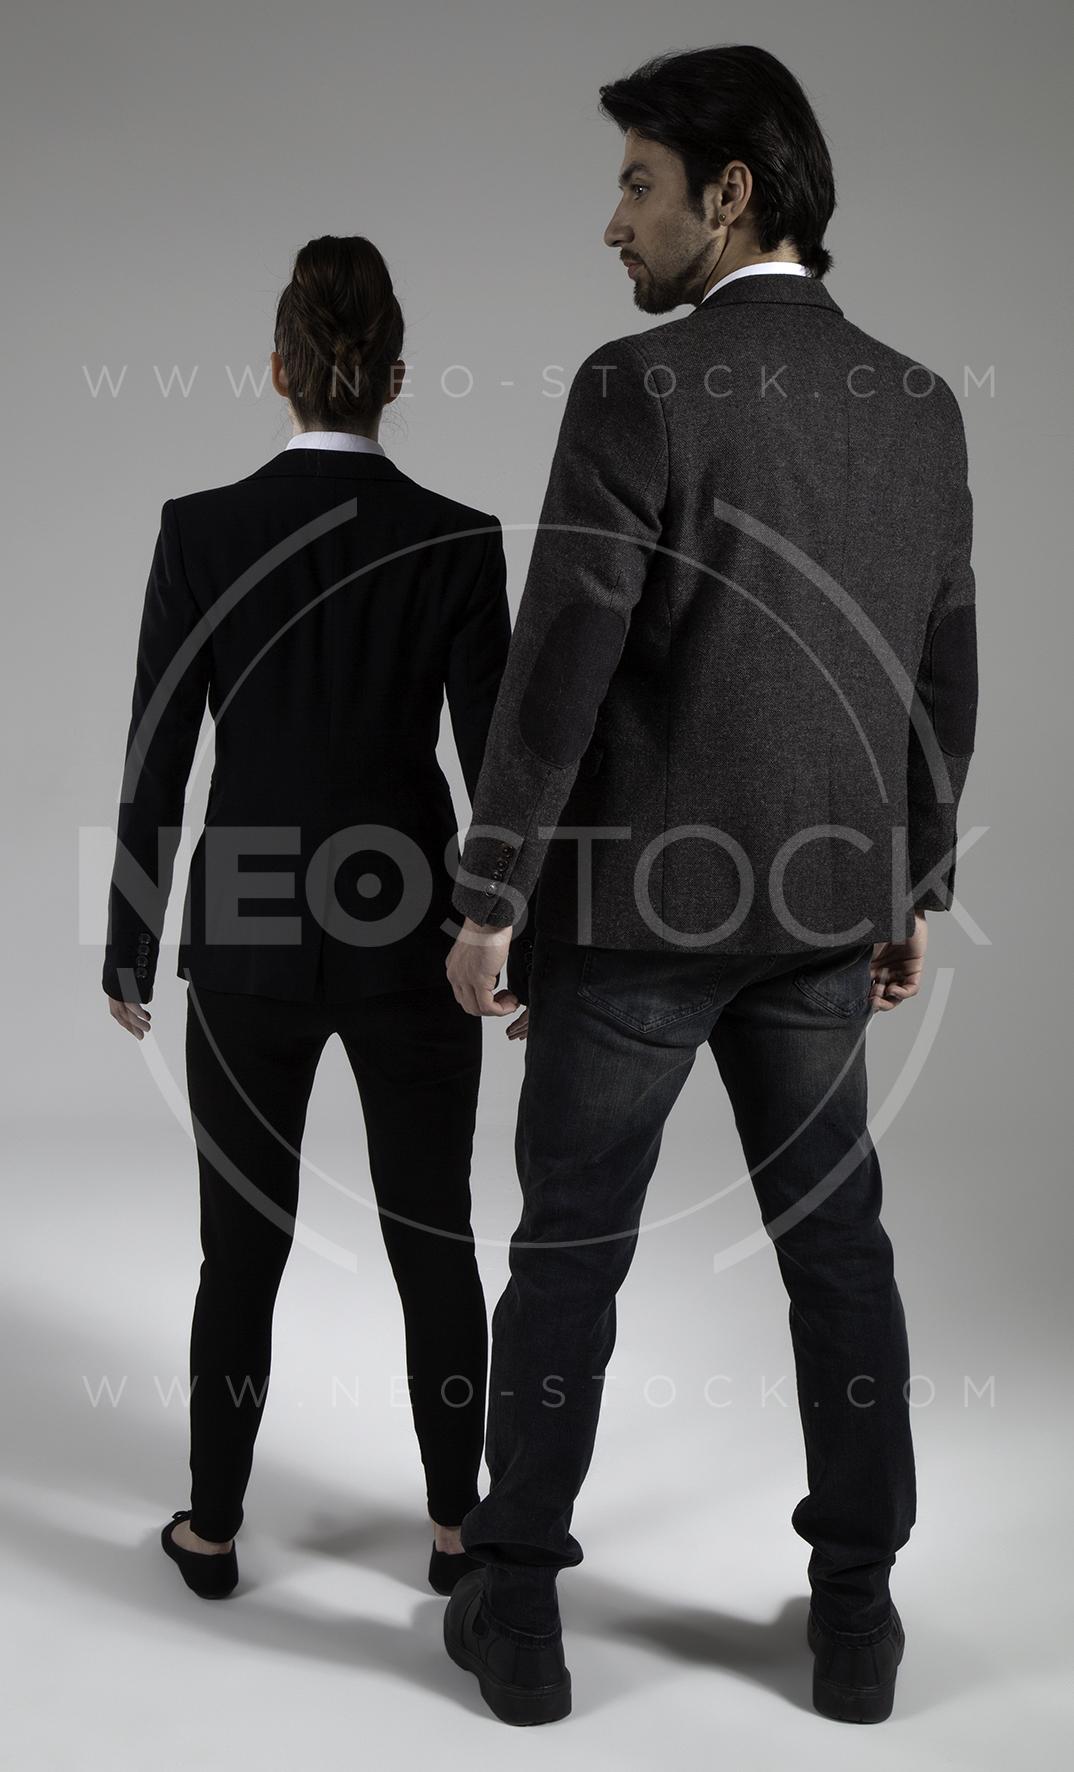 NeoStock - Cop Drama Duo - Stock Photography I